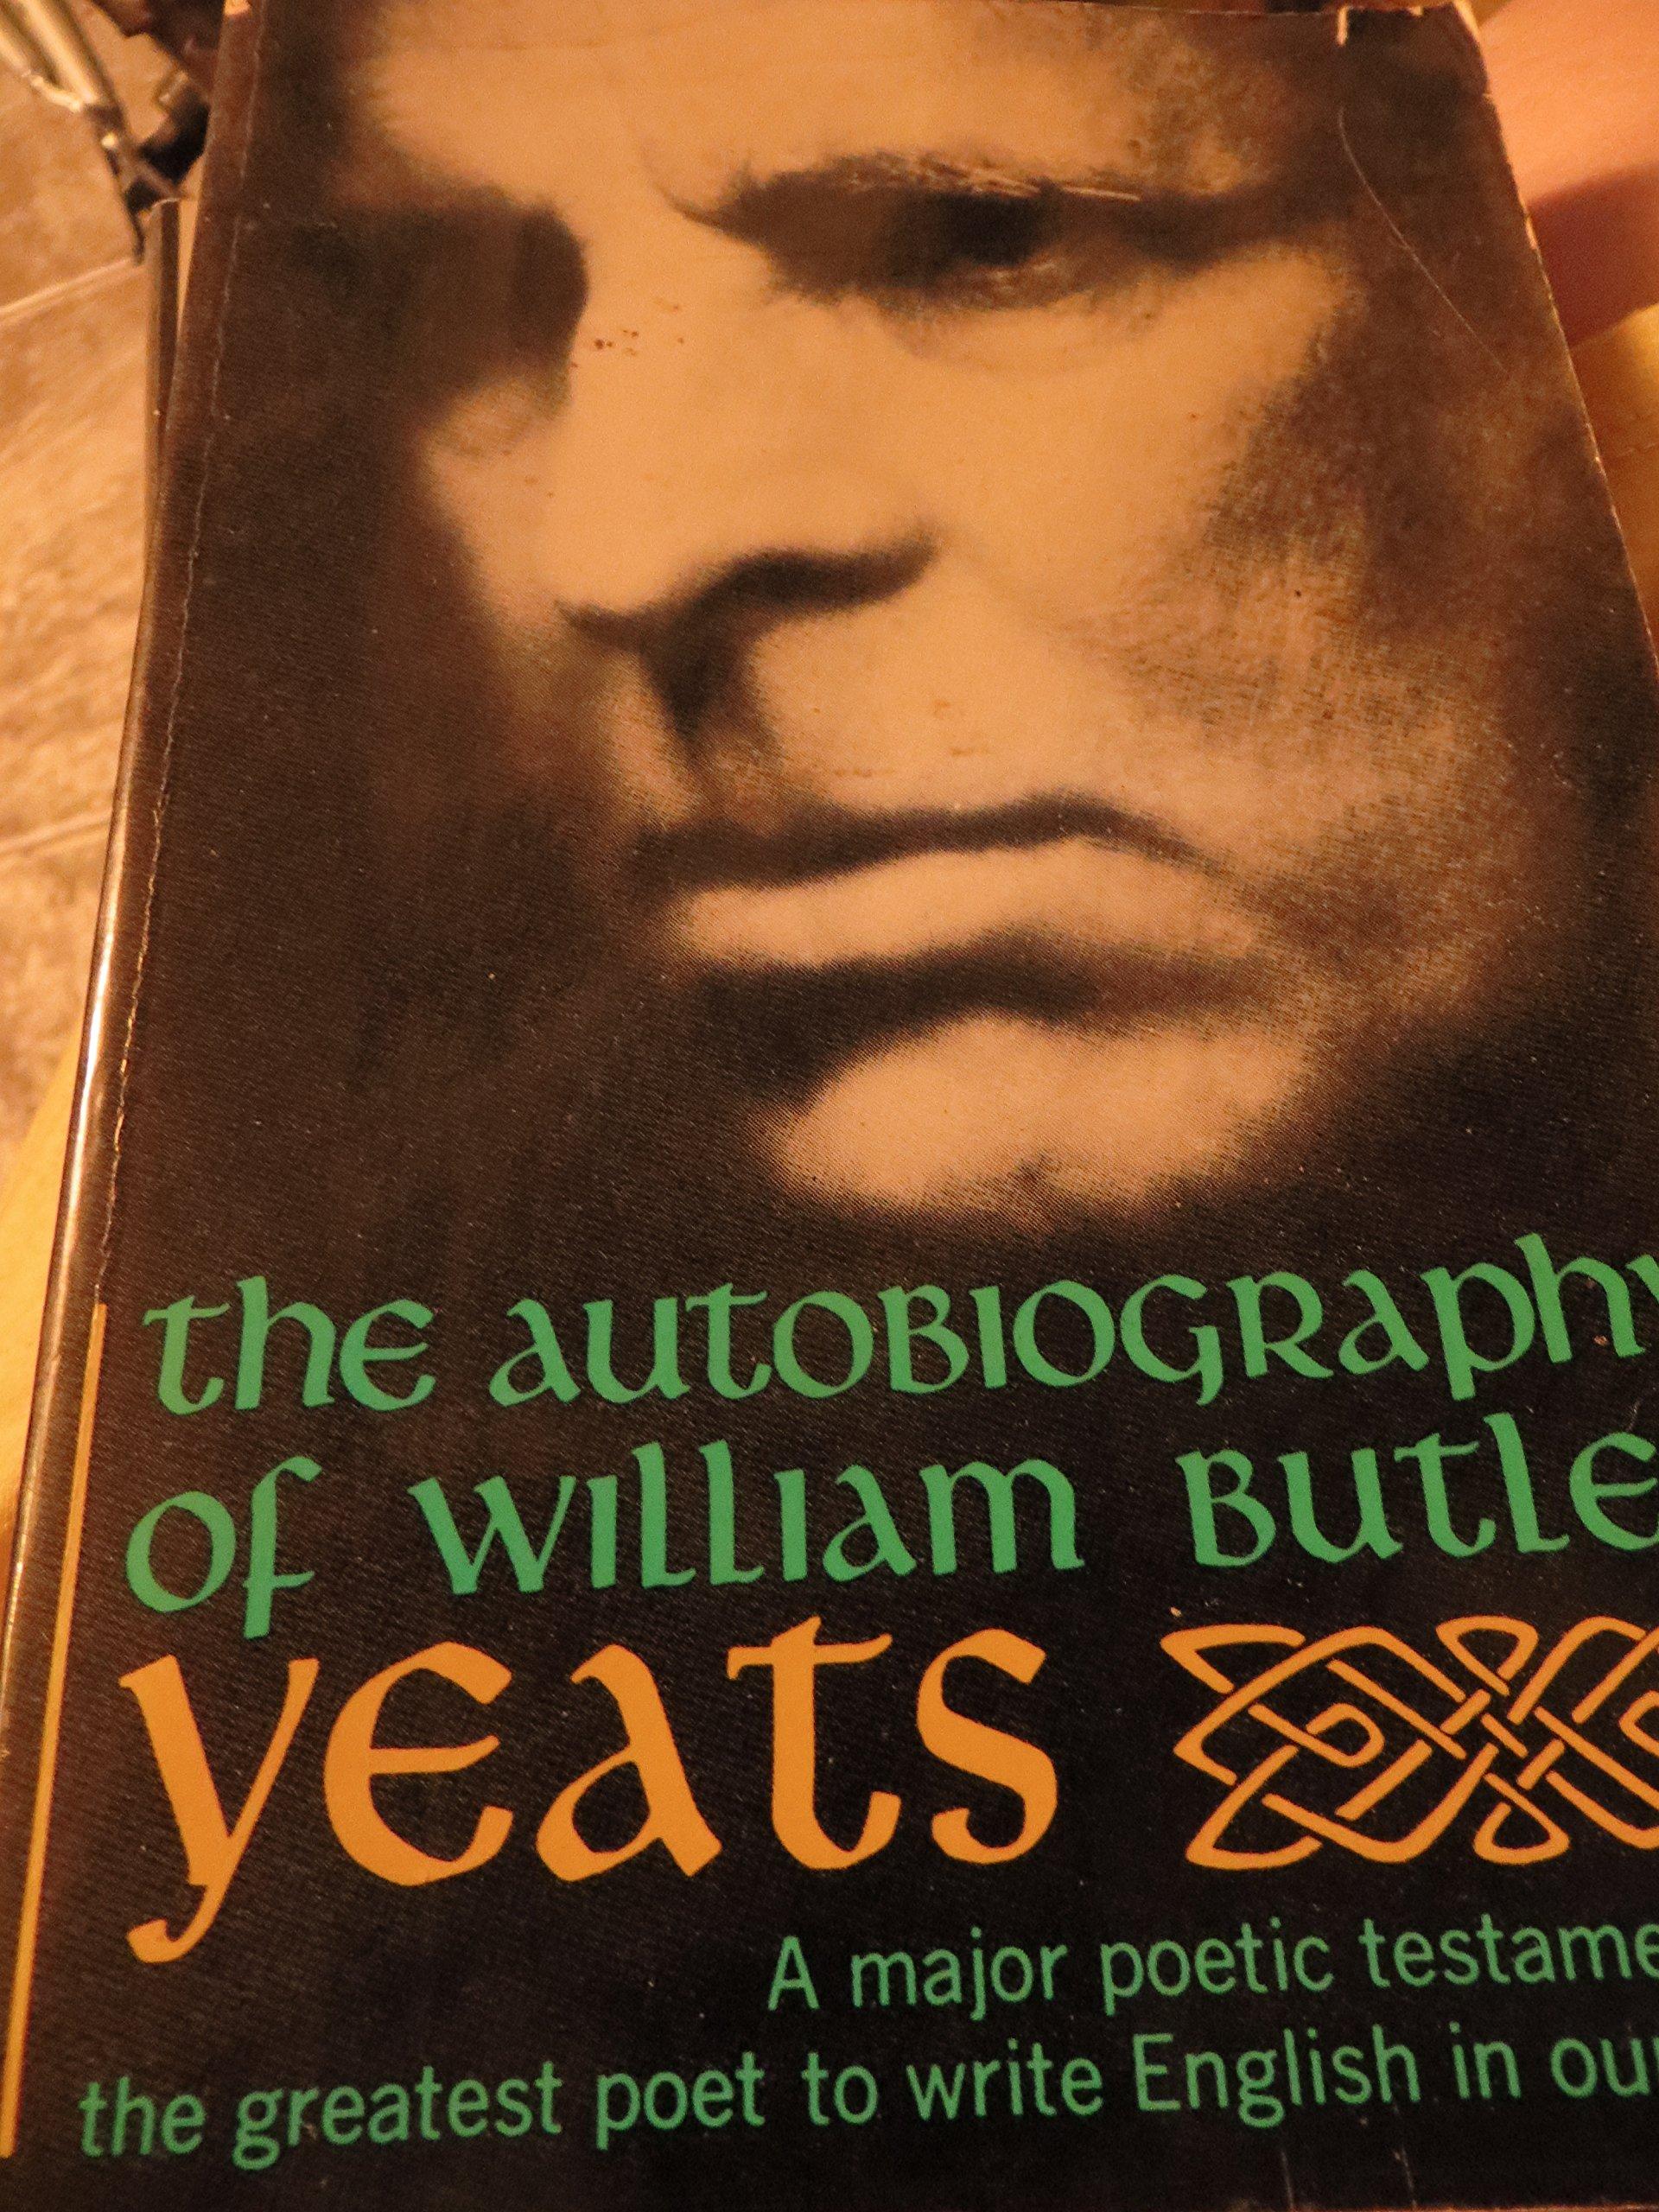 William Butler Yeats Yeats, William Butler - Essay